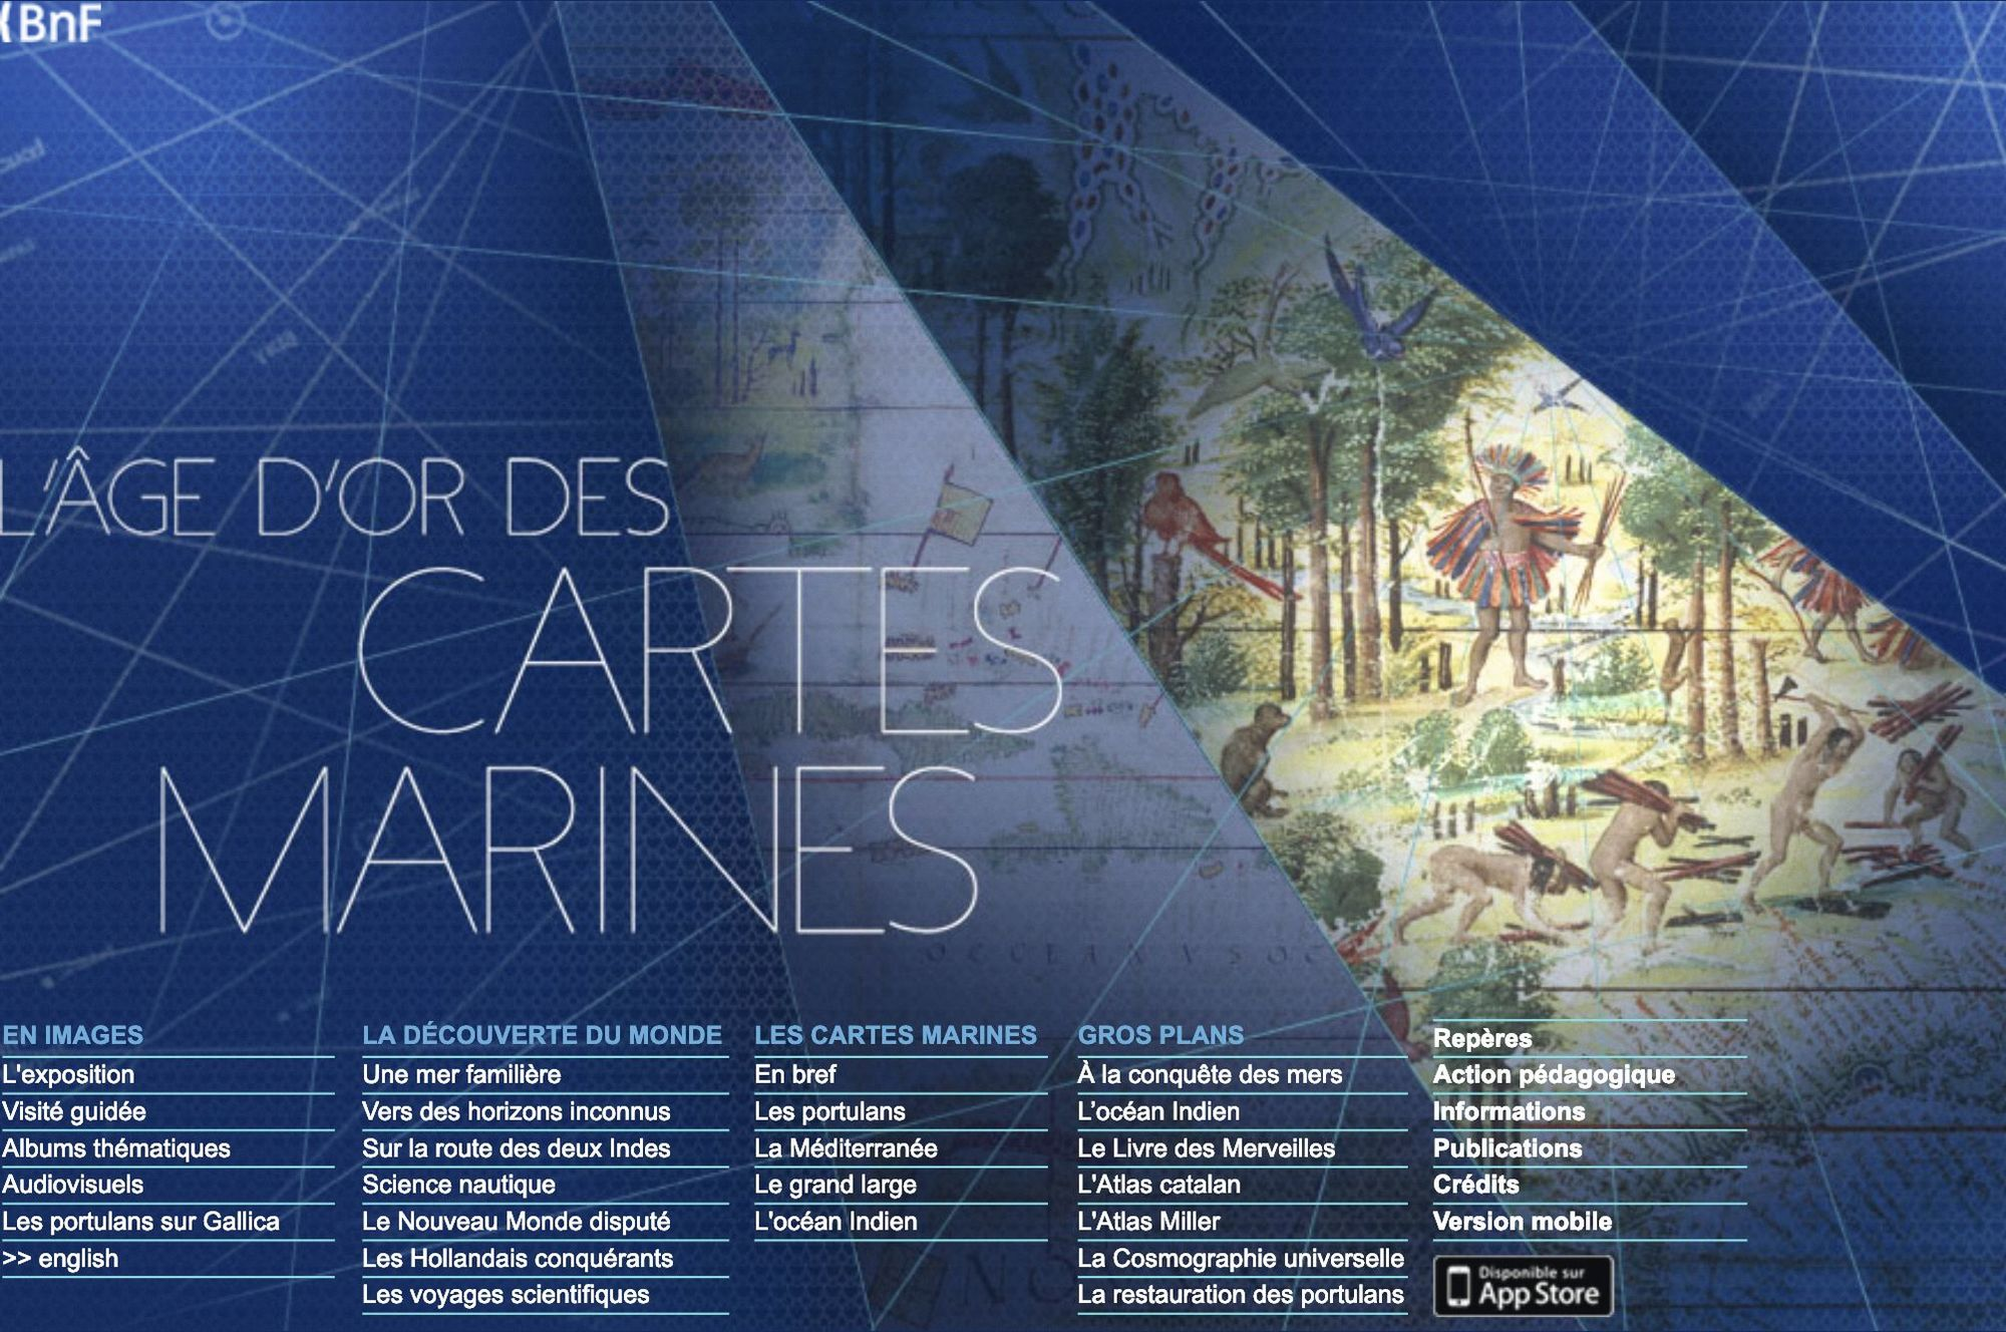 « L'âge d'or des cartes marines », exposition de la BnF, 2012-2013